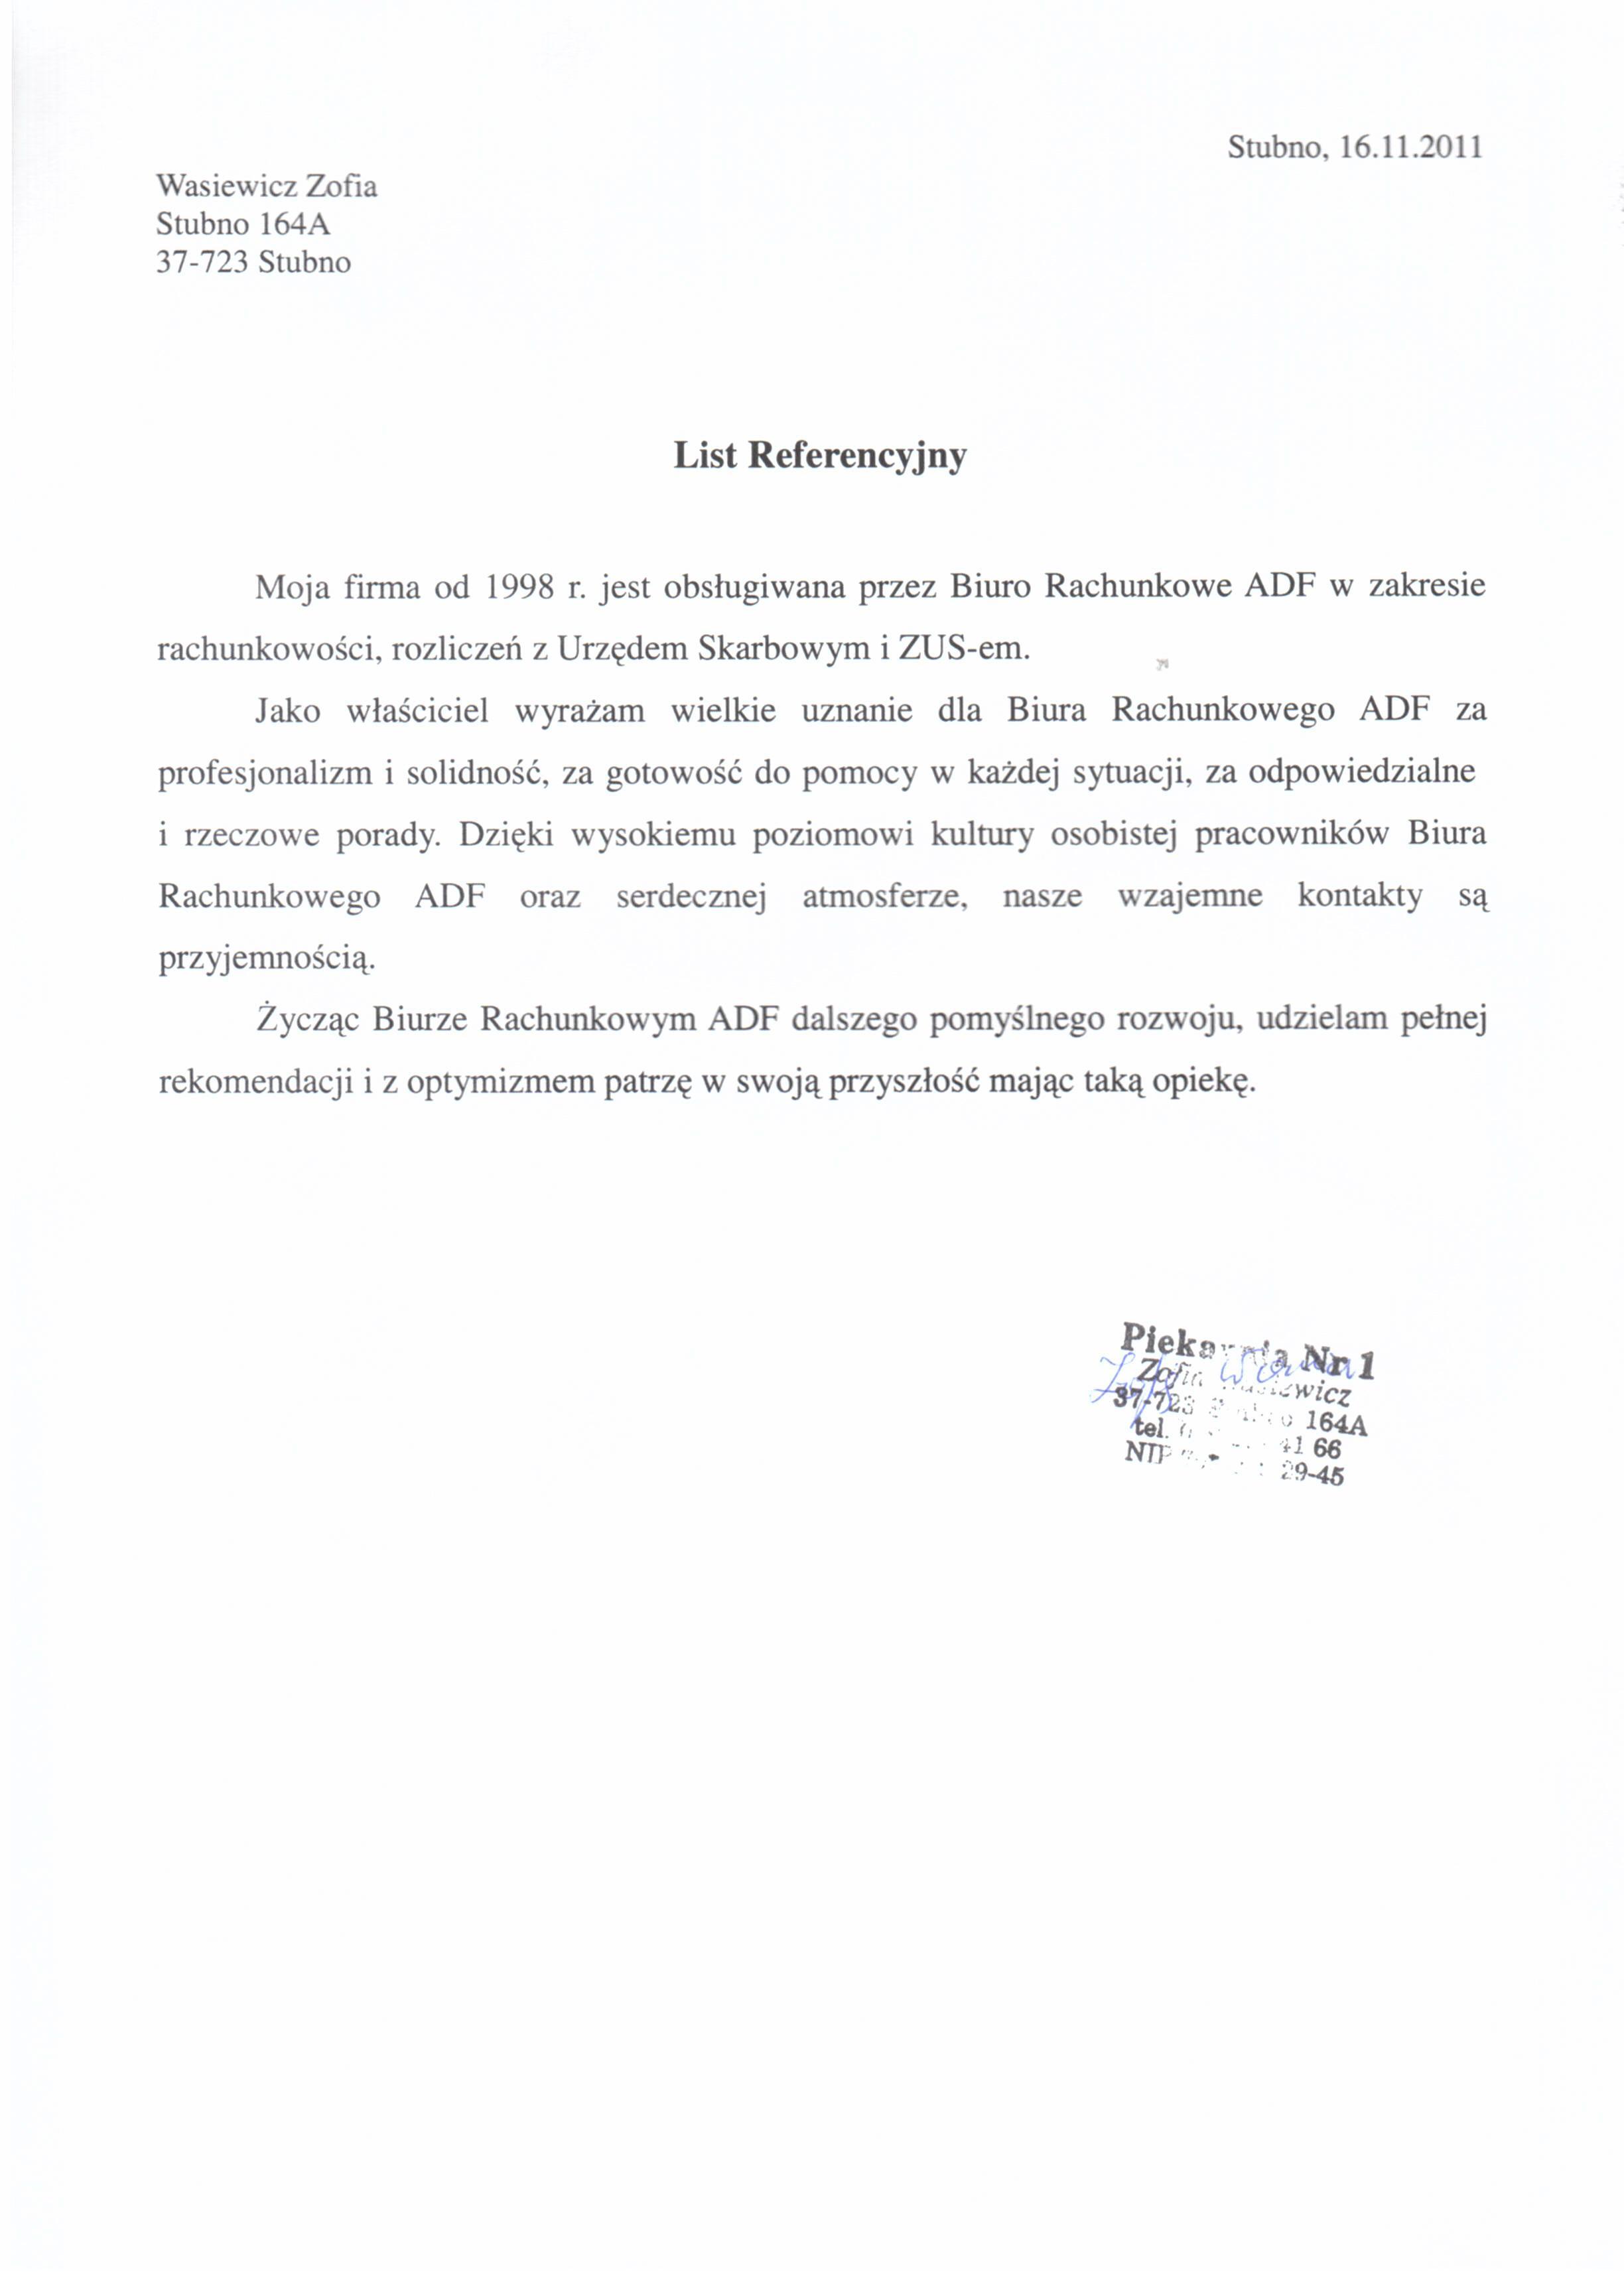 Biuro Rachunkowe ADF - referencje 5